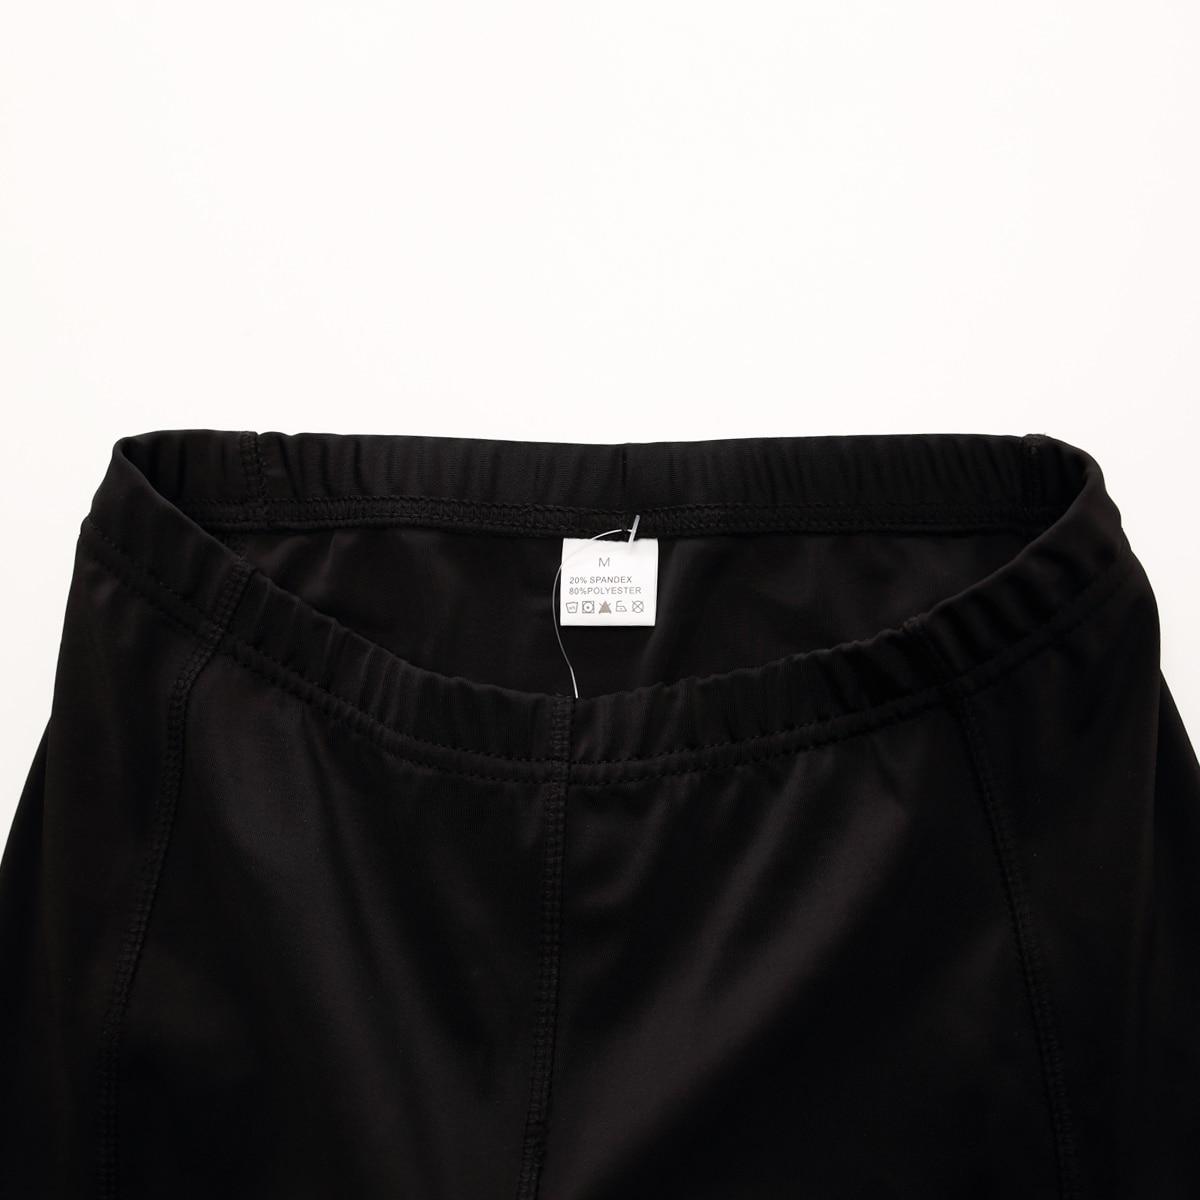 rápida pro ciclismo shorts roupas de bicicleta ropa ciclismo